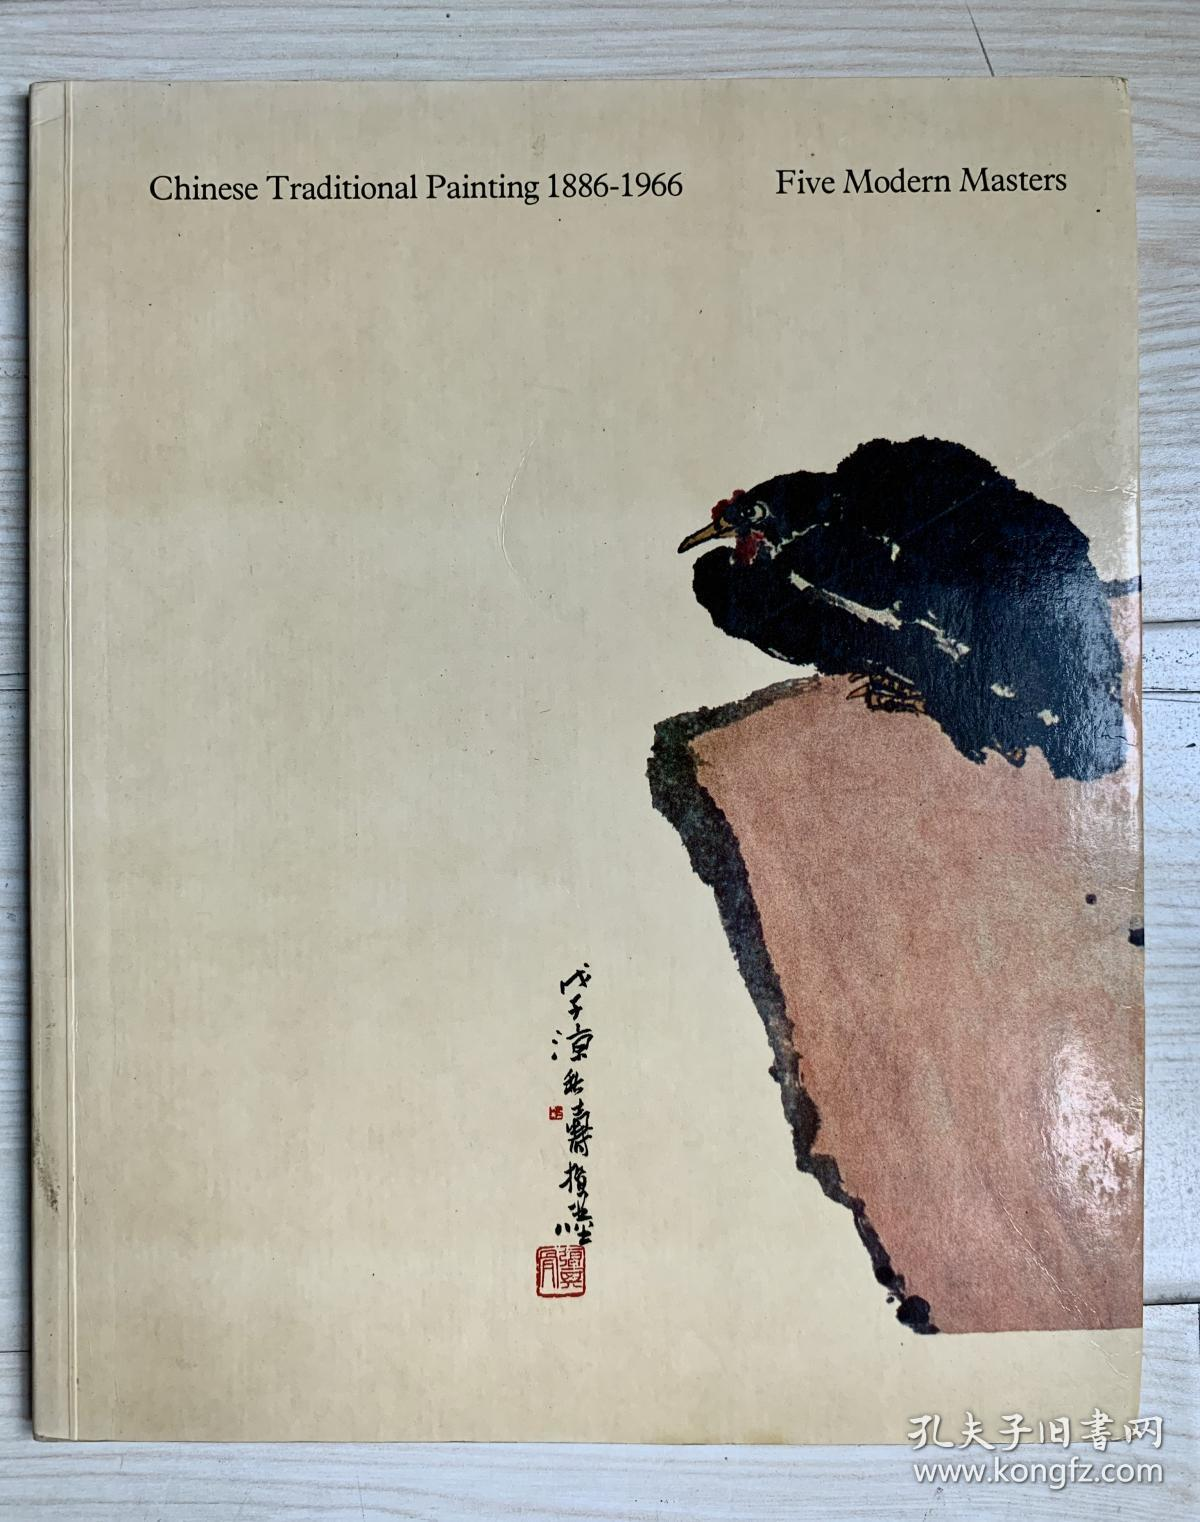 1982年 英国伦敦皇家艺术学院出版 《中国近代五位杰出画家 chinese traditional painting 1886-1966 five modern masters》